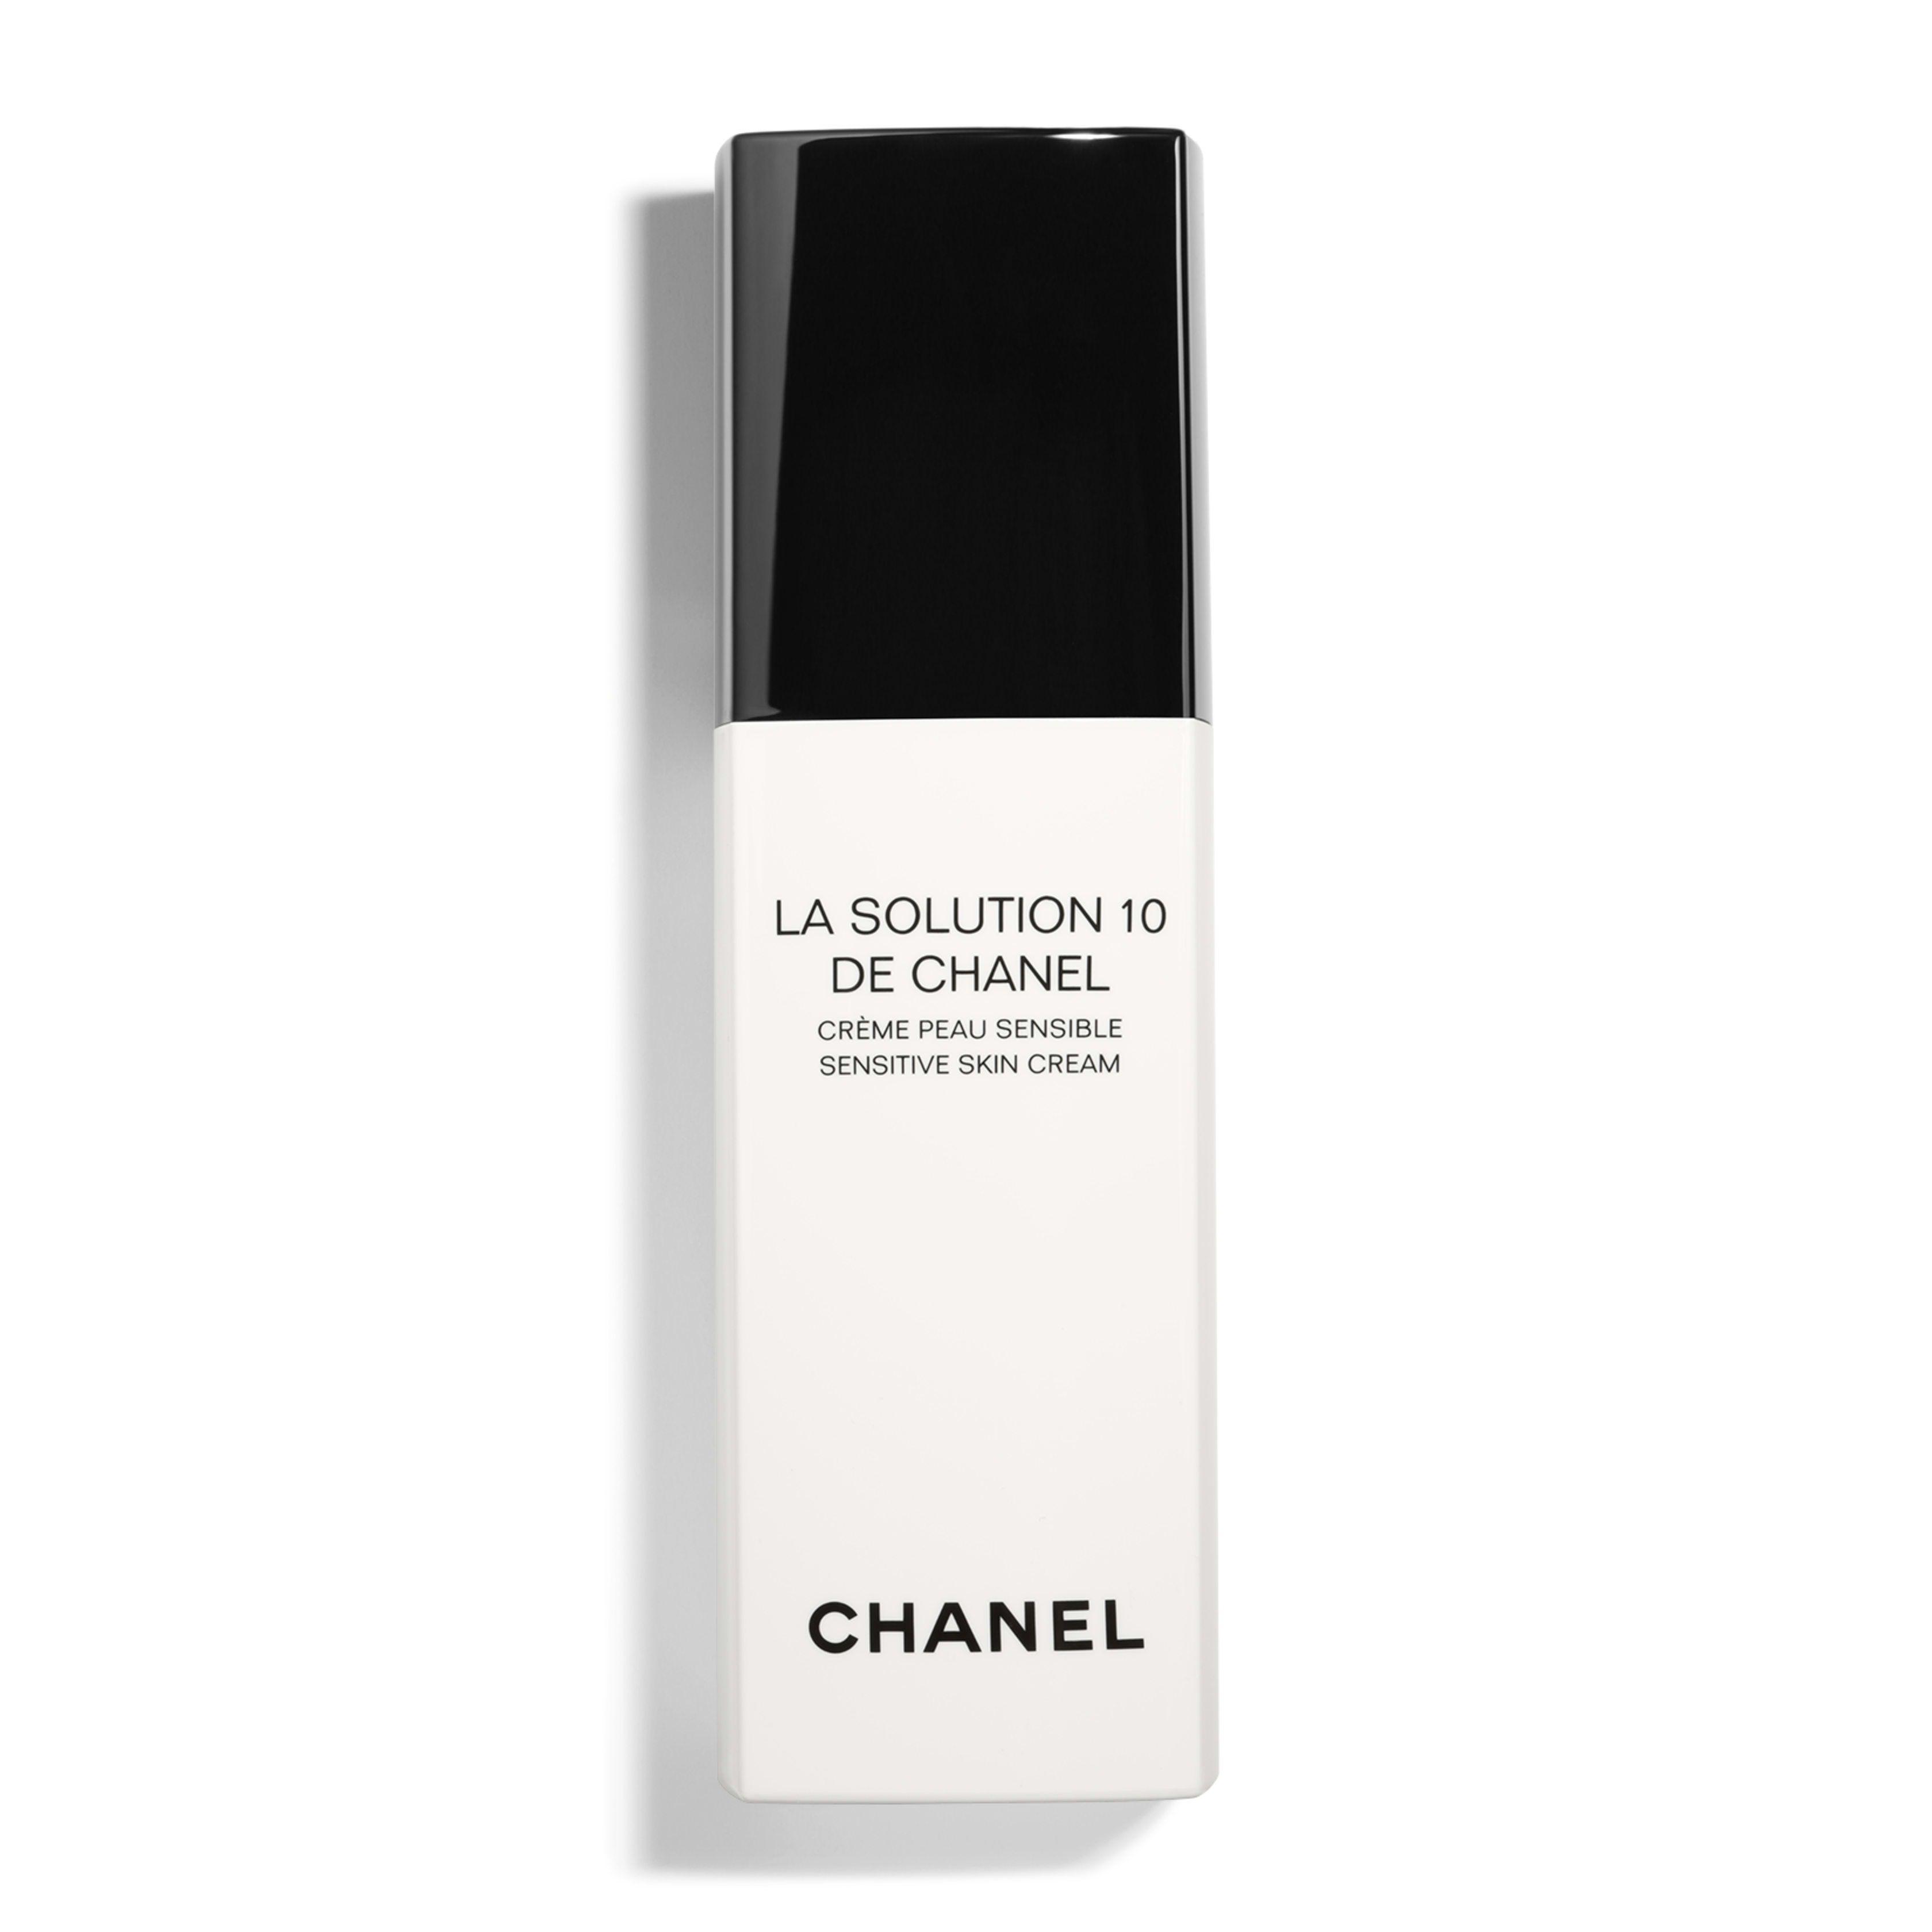 LA SOLUTION 10 DE CHANEL Sensitive Skin Cream (With images